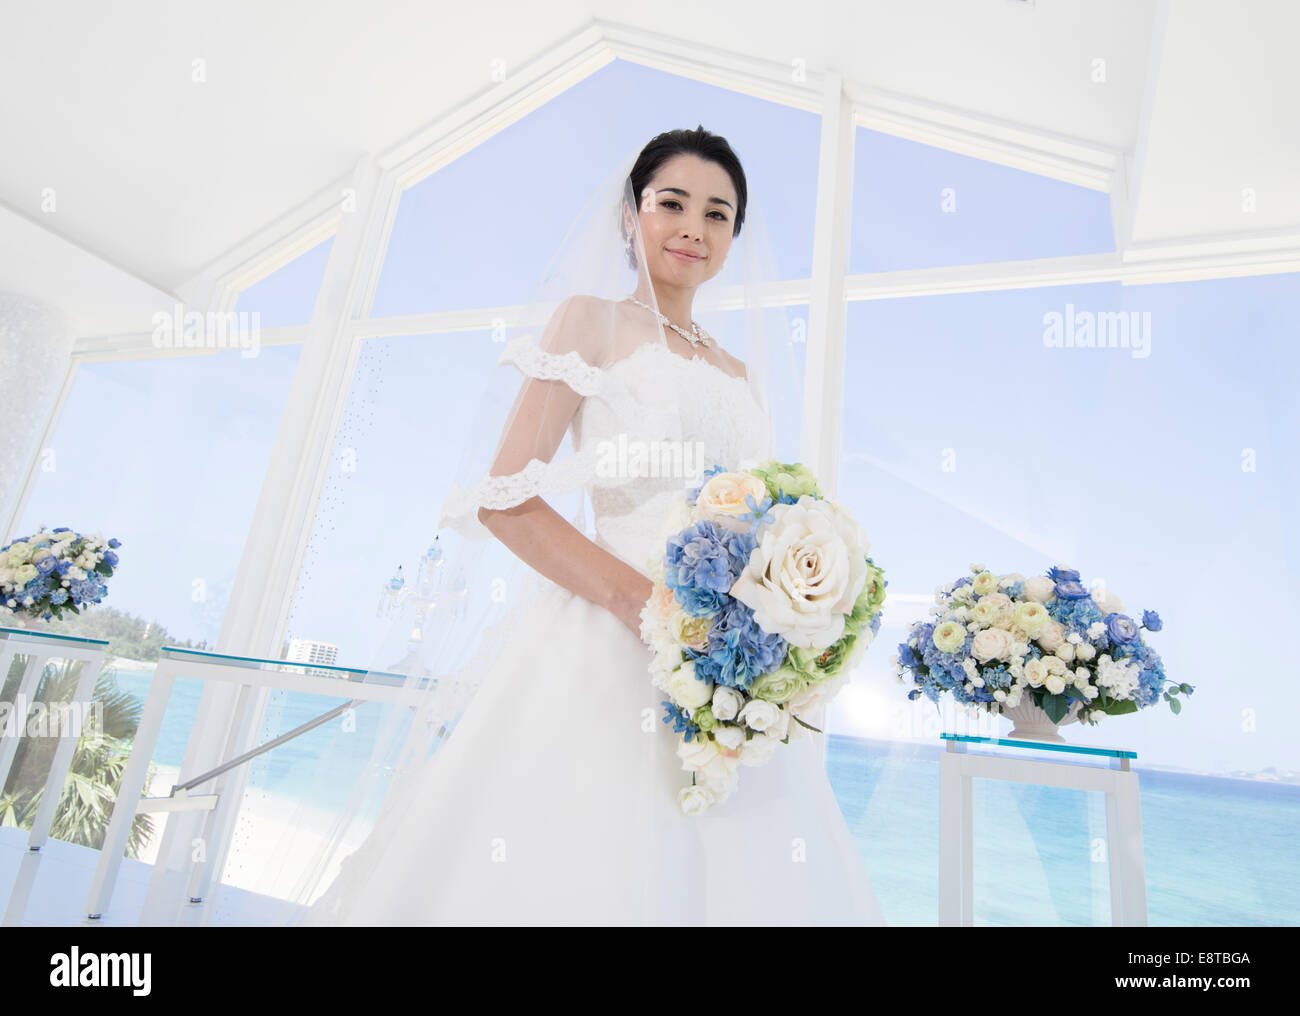 Modern Chinese Wedding Dress Stock Photos & Modern Chinese Wedding ...